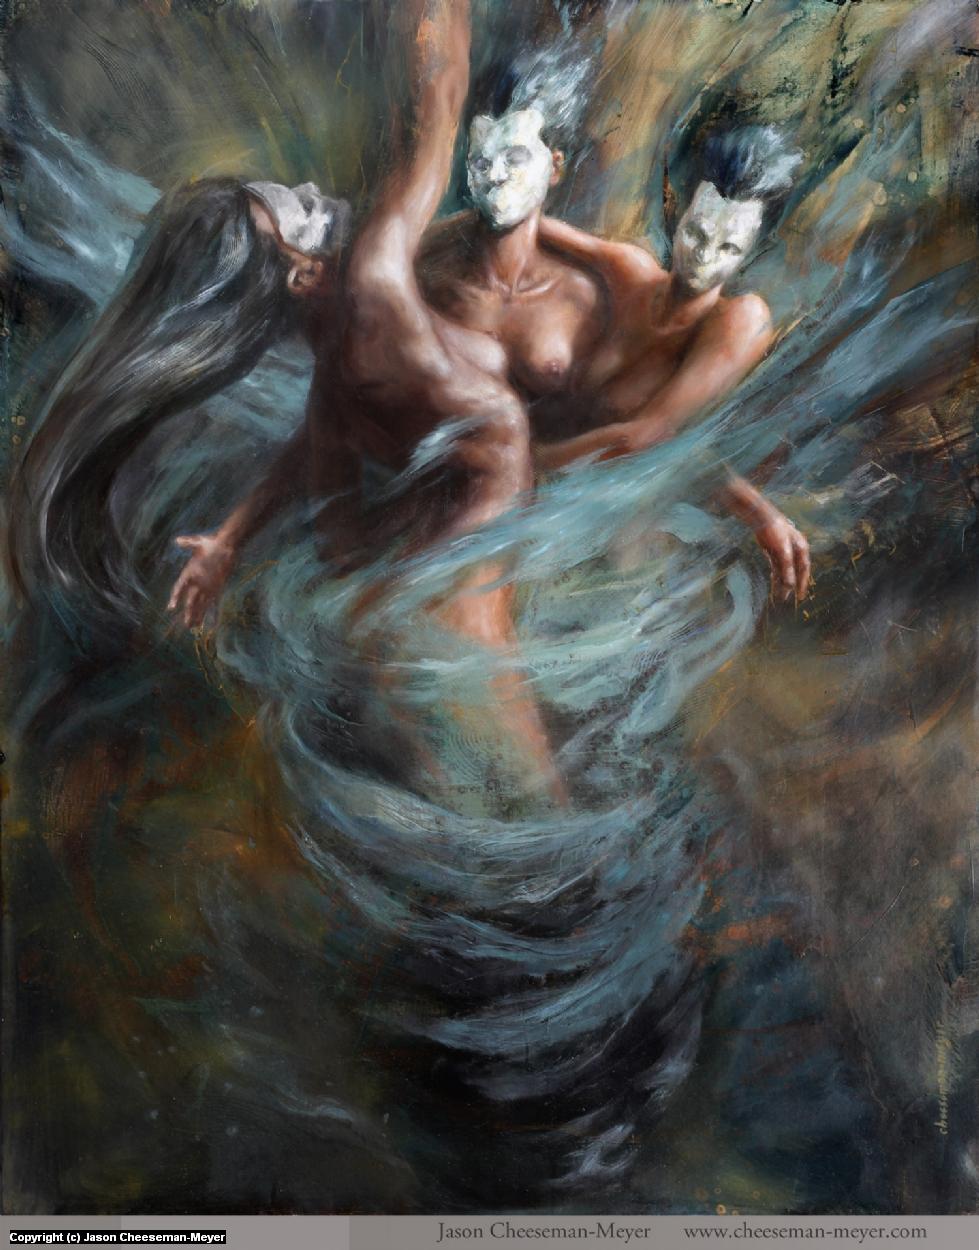 Triumvirate Replicating Artwork by Jason Cheeseman-Meyer